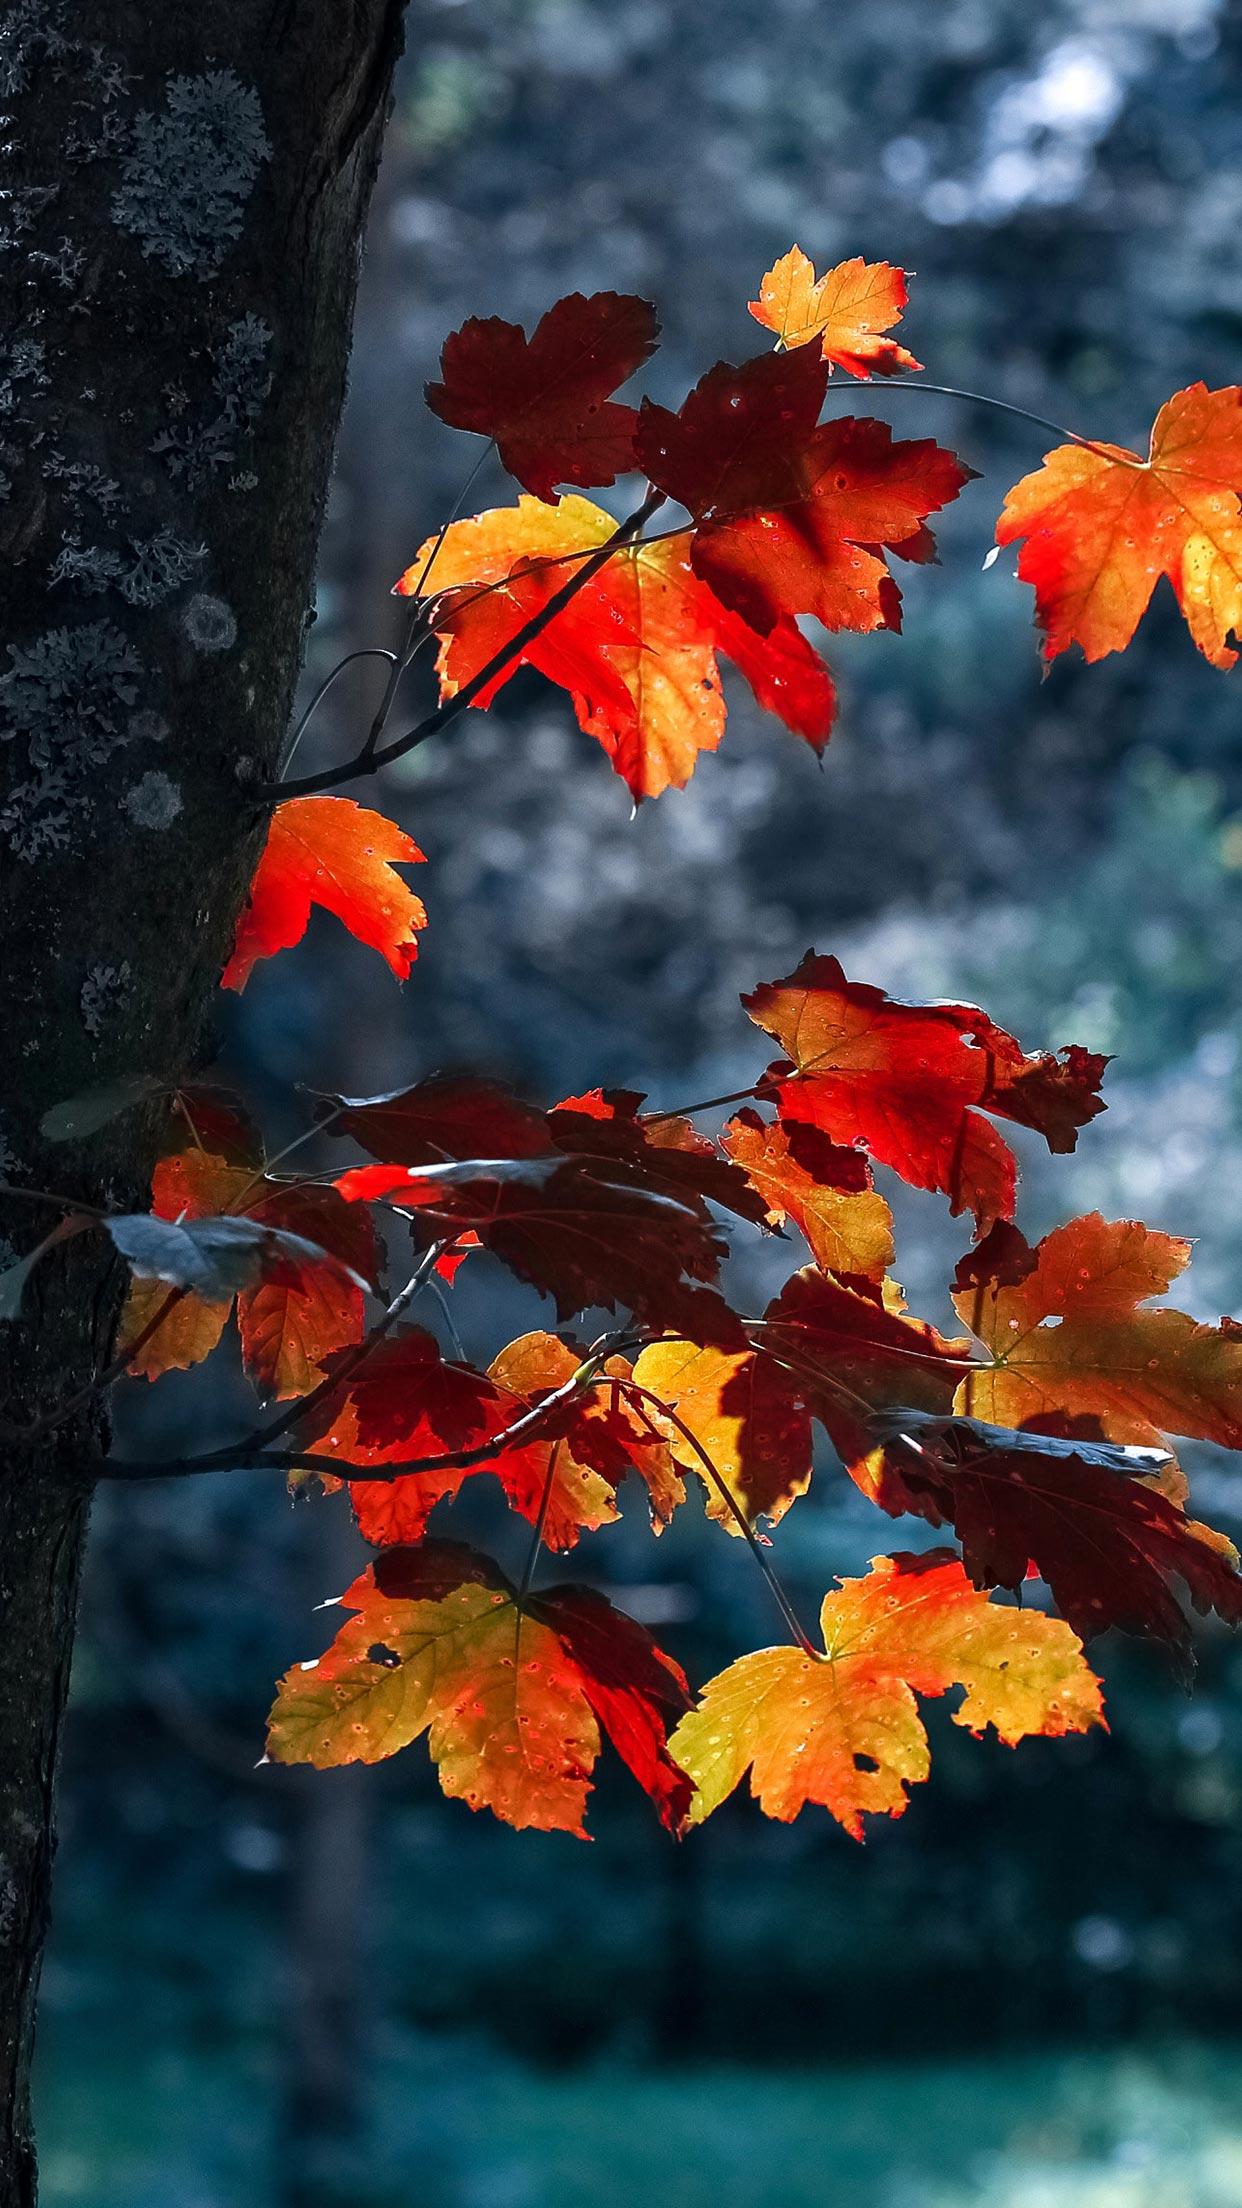 Girly Autumn Wallpaper 15 Fall Iphone Xs Wallpapers 1242x2208 Wallpaper Teahub Io